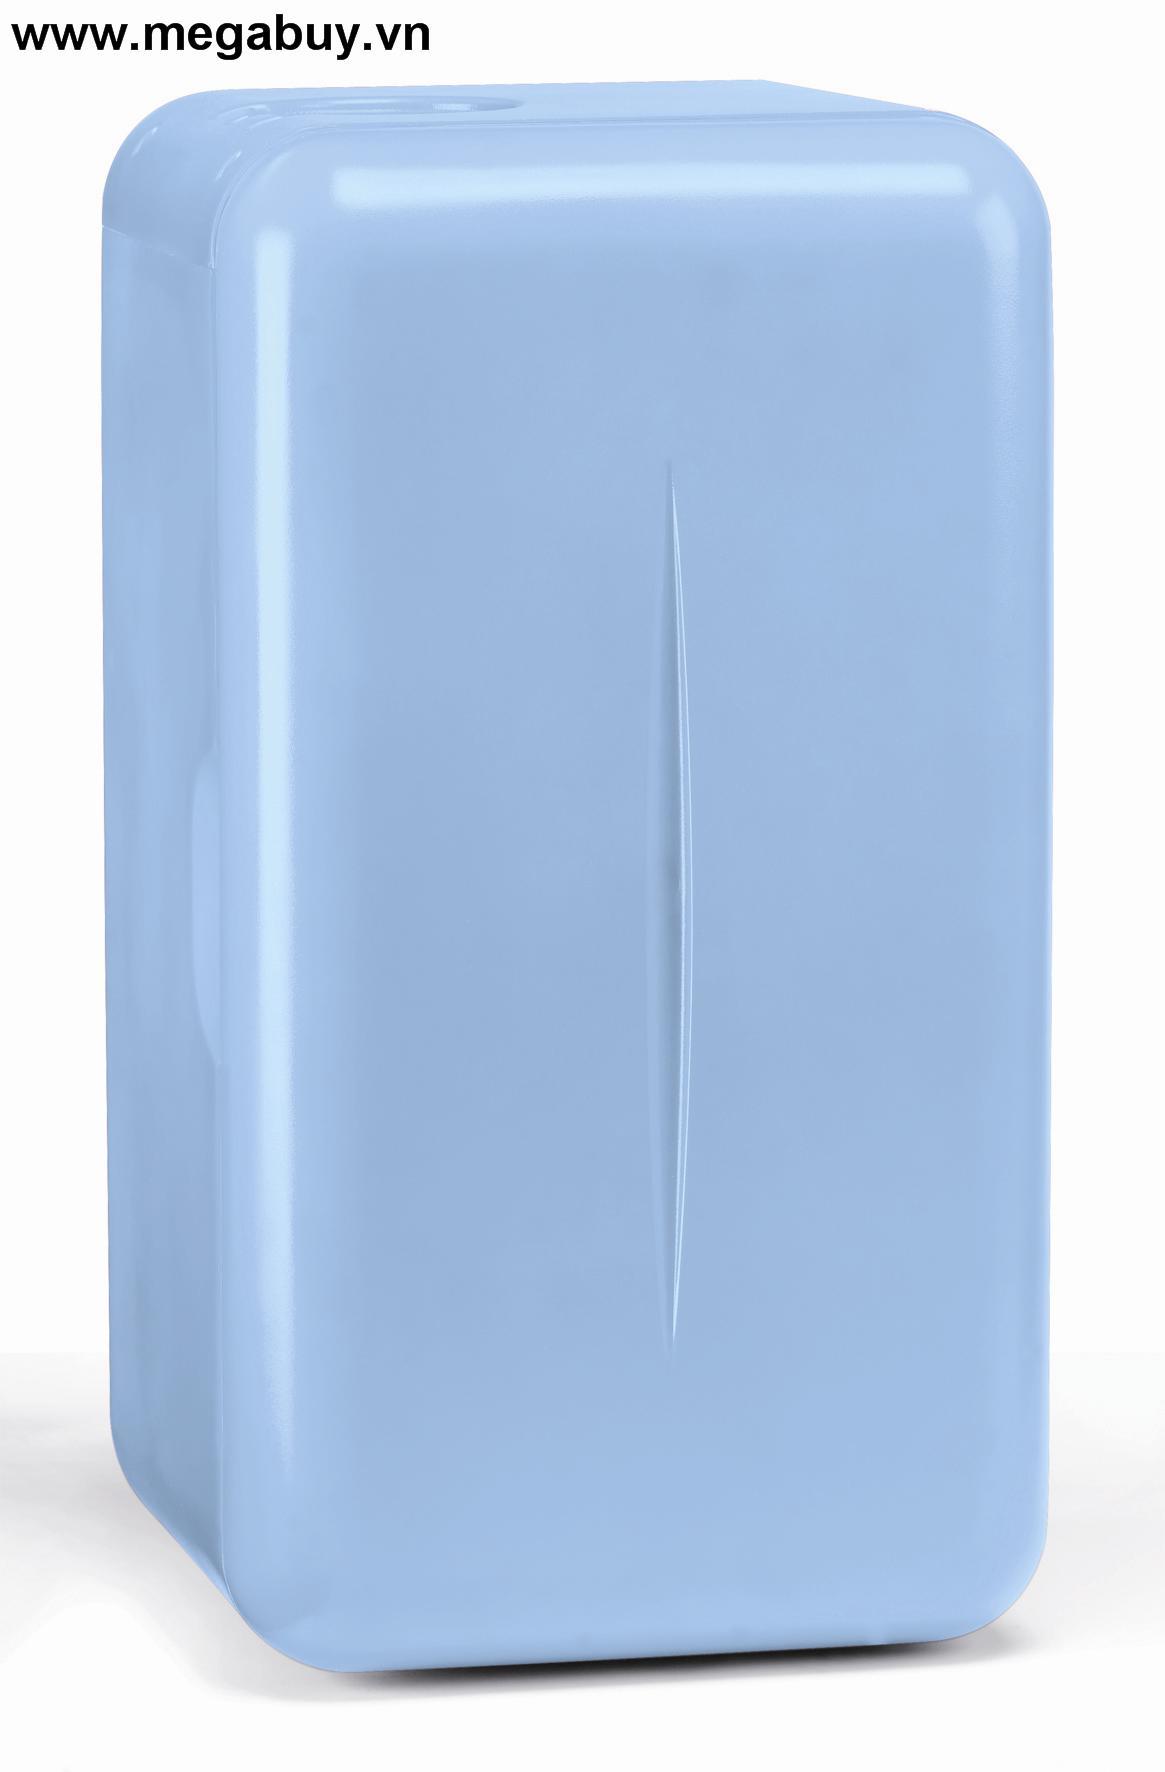 Tủ lạnh di động mini Mobicool F16AC (Dark blue) 15 Lít